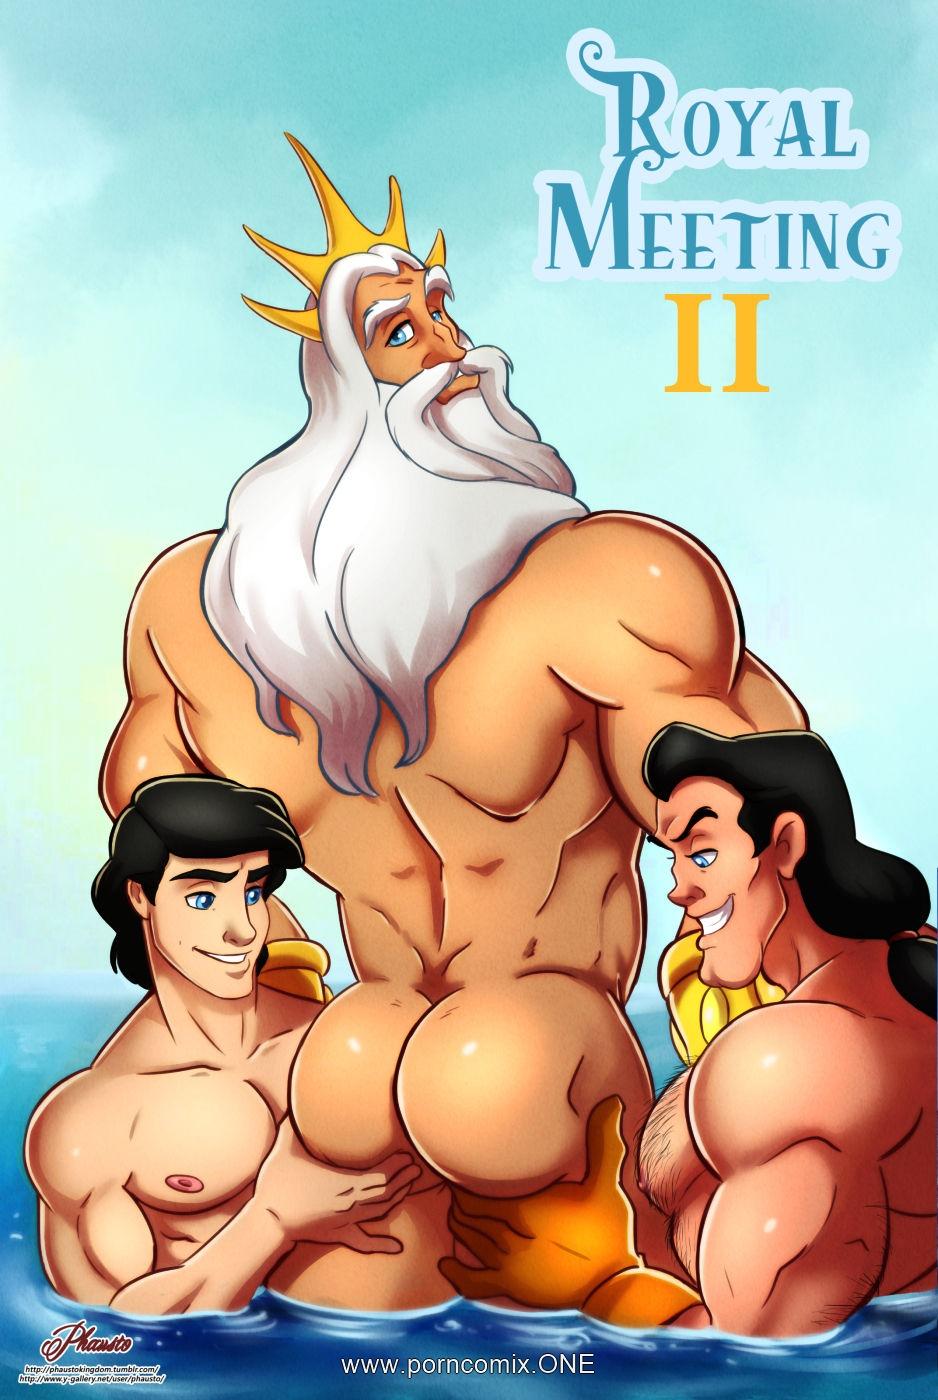 Porn Comics - Royal Meeting 2 porn comics 8 muses